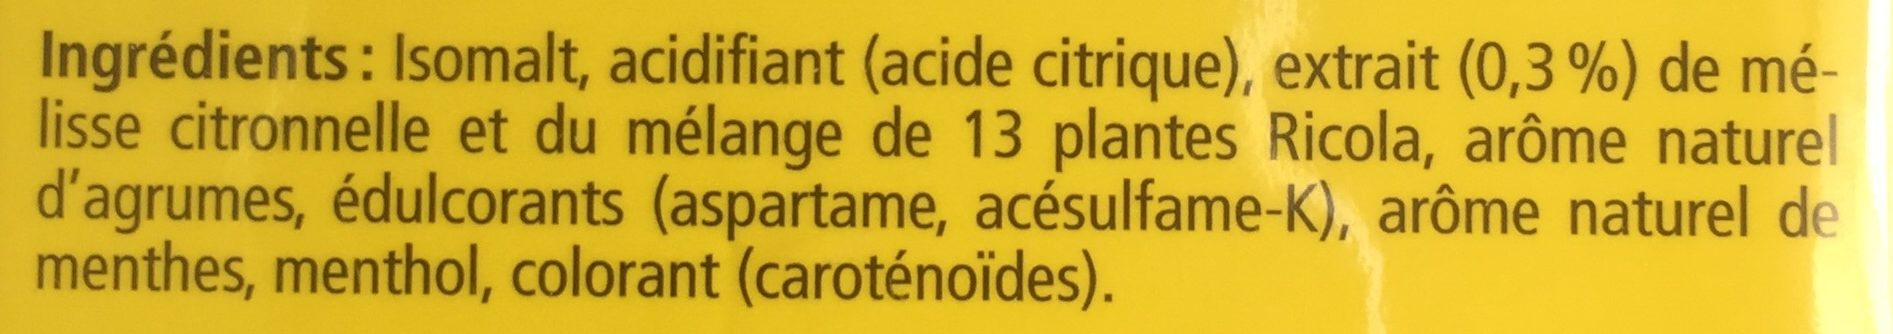 Ricola citron melisse - Ingredients